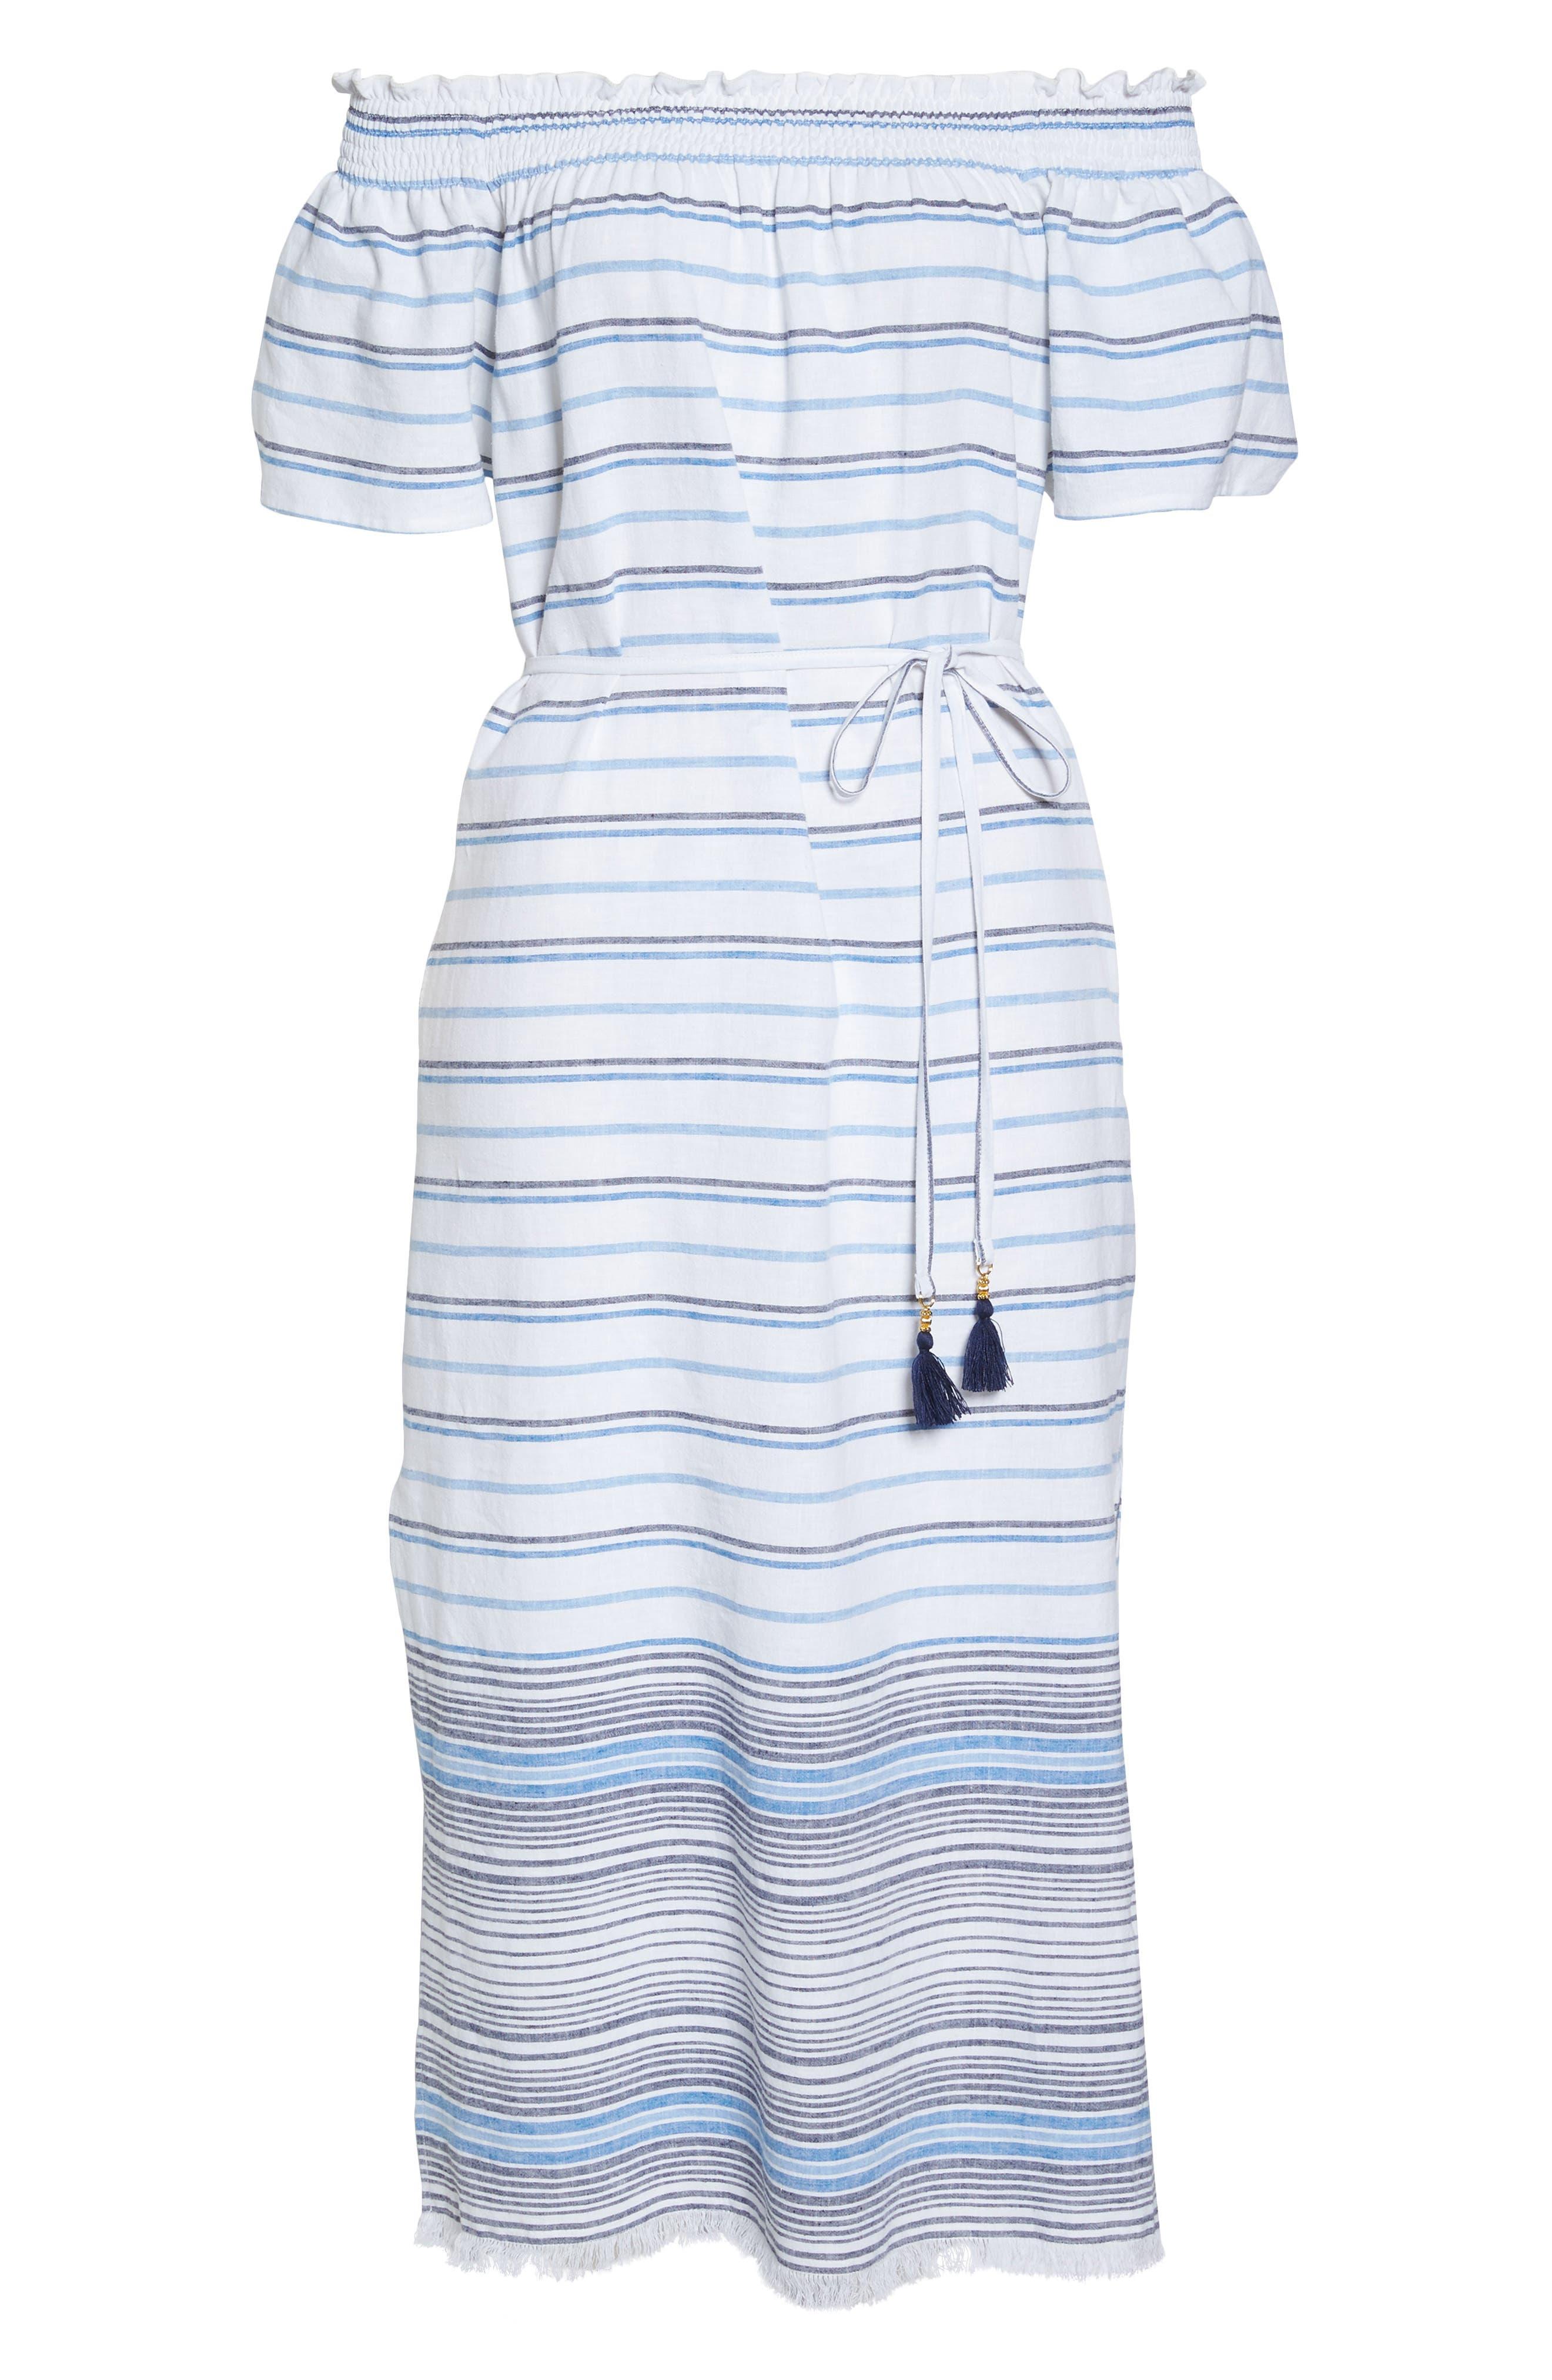 Stripe Linen & Cotton Off the Shoulder Cover-Up Dress,                             Alternate thumbnail 6, color,                             100